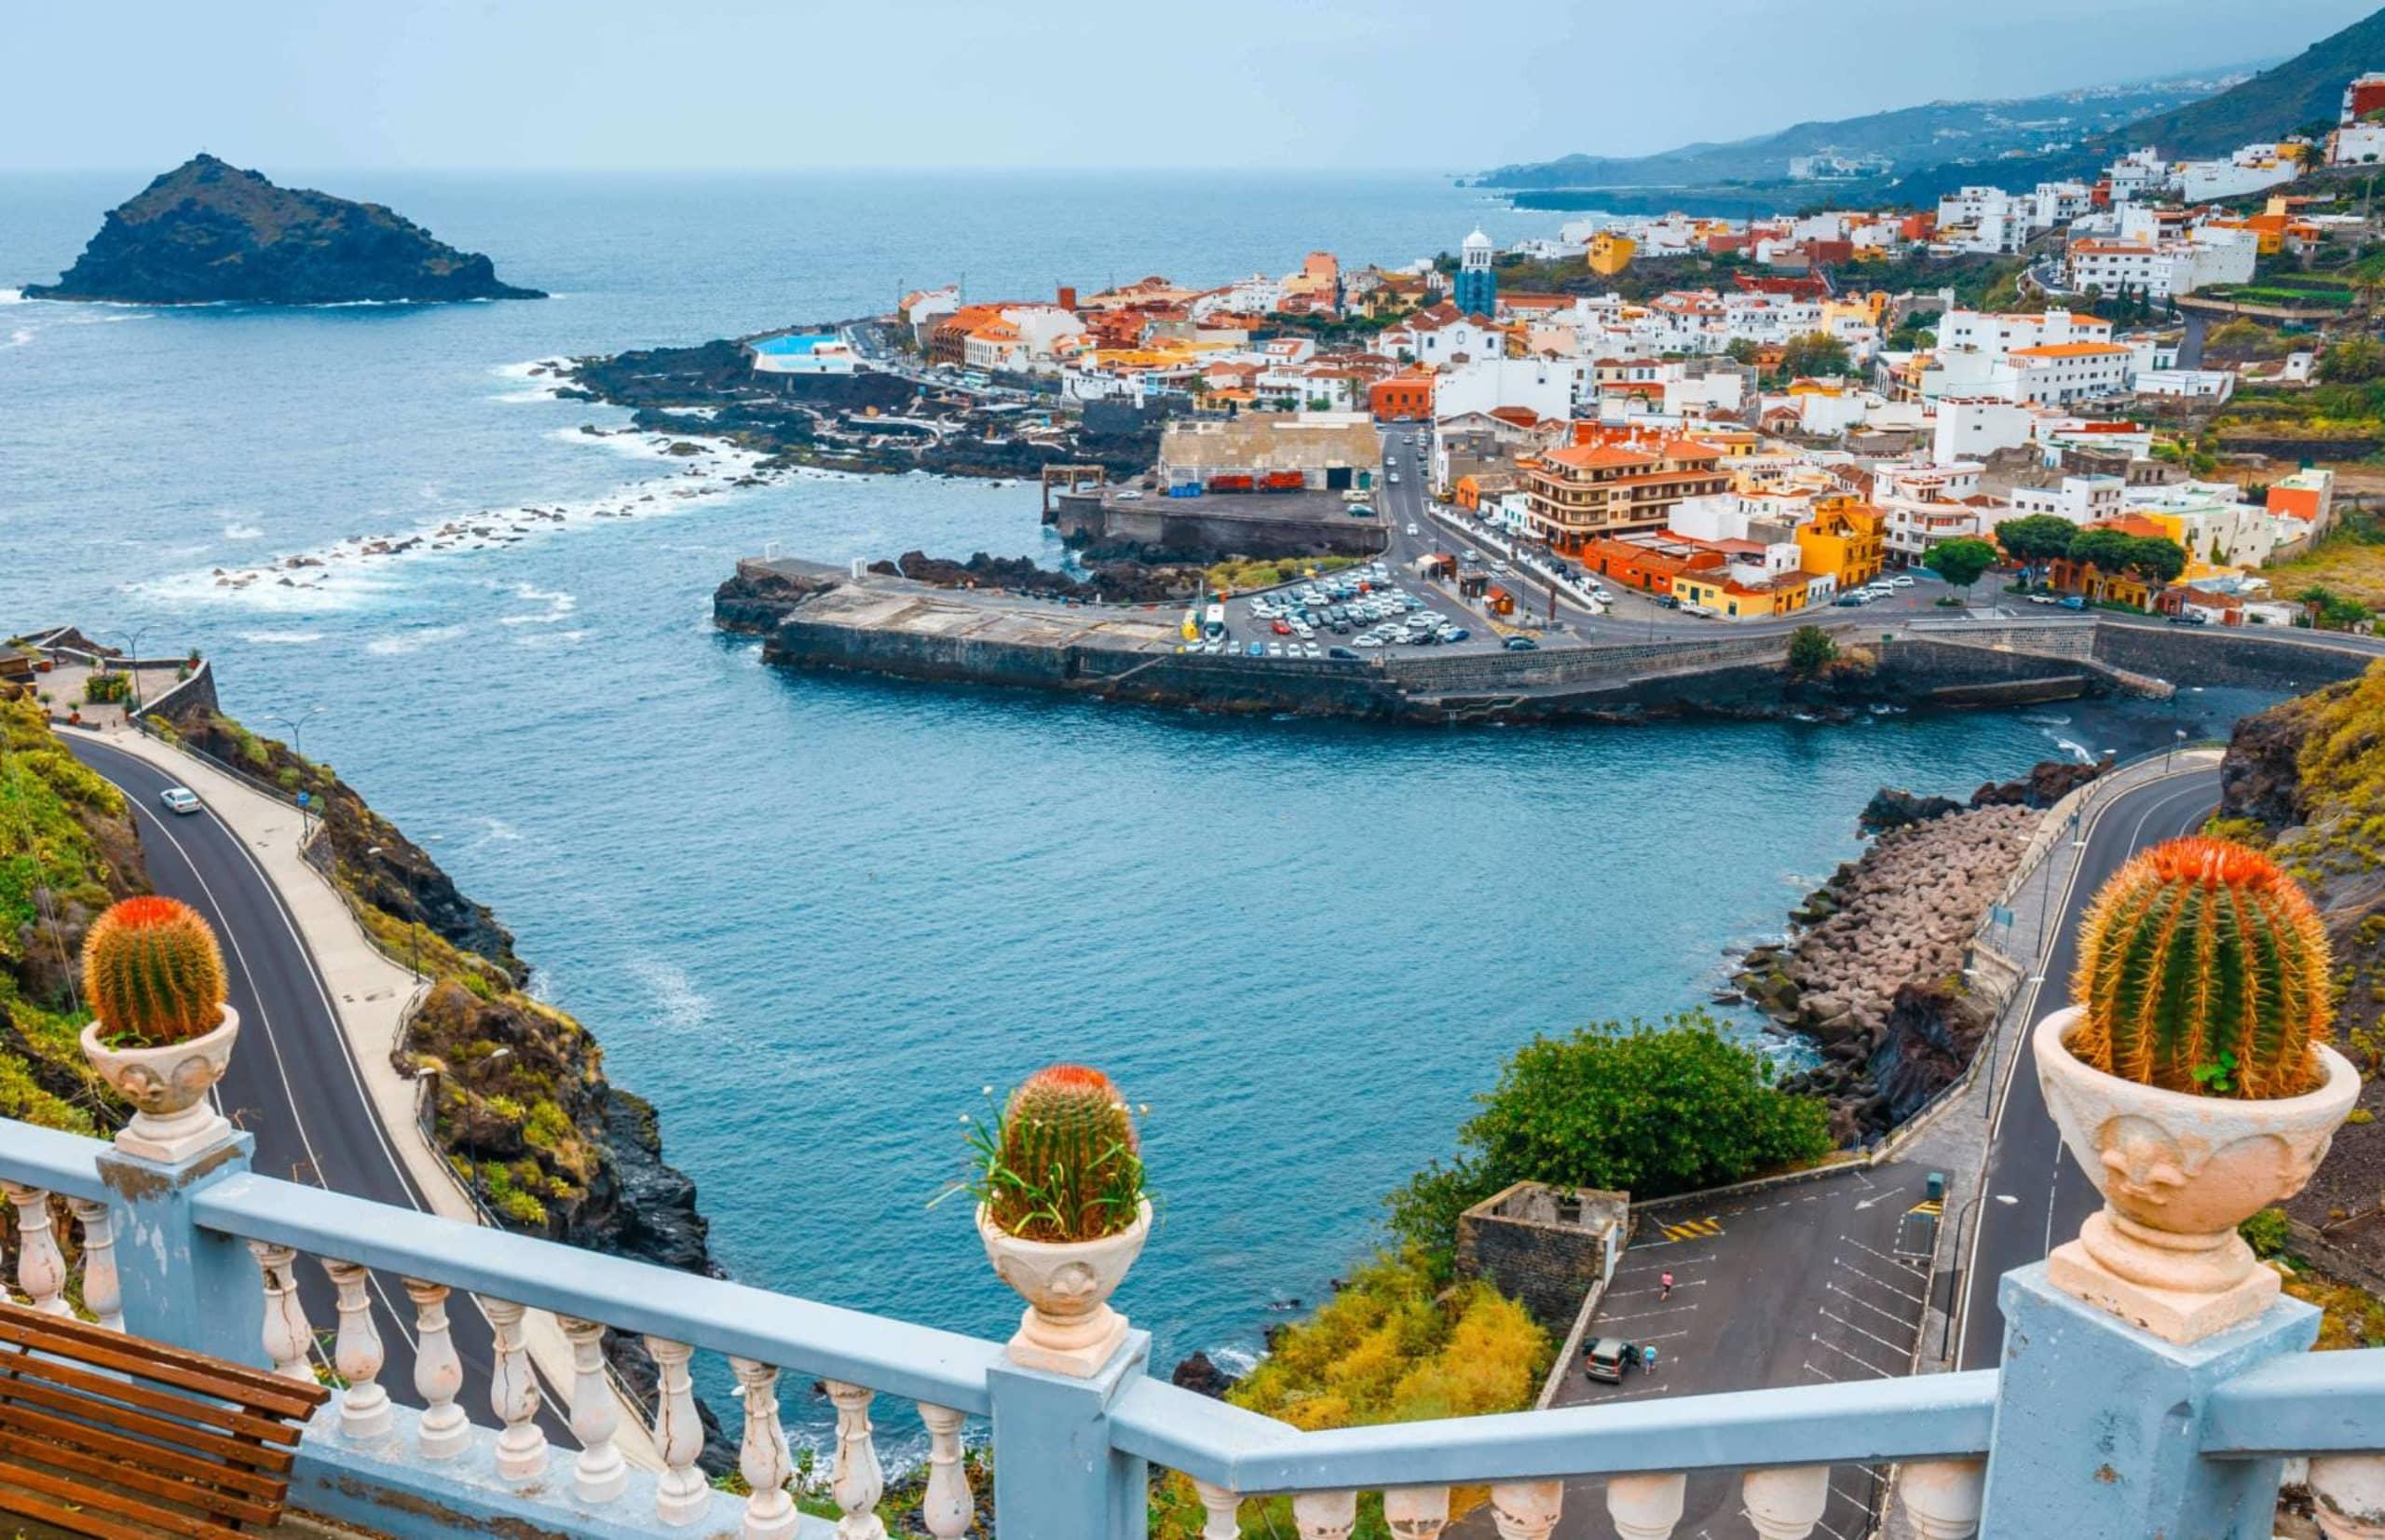 Holiday Home Tenerife - Home